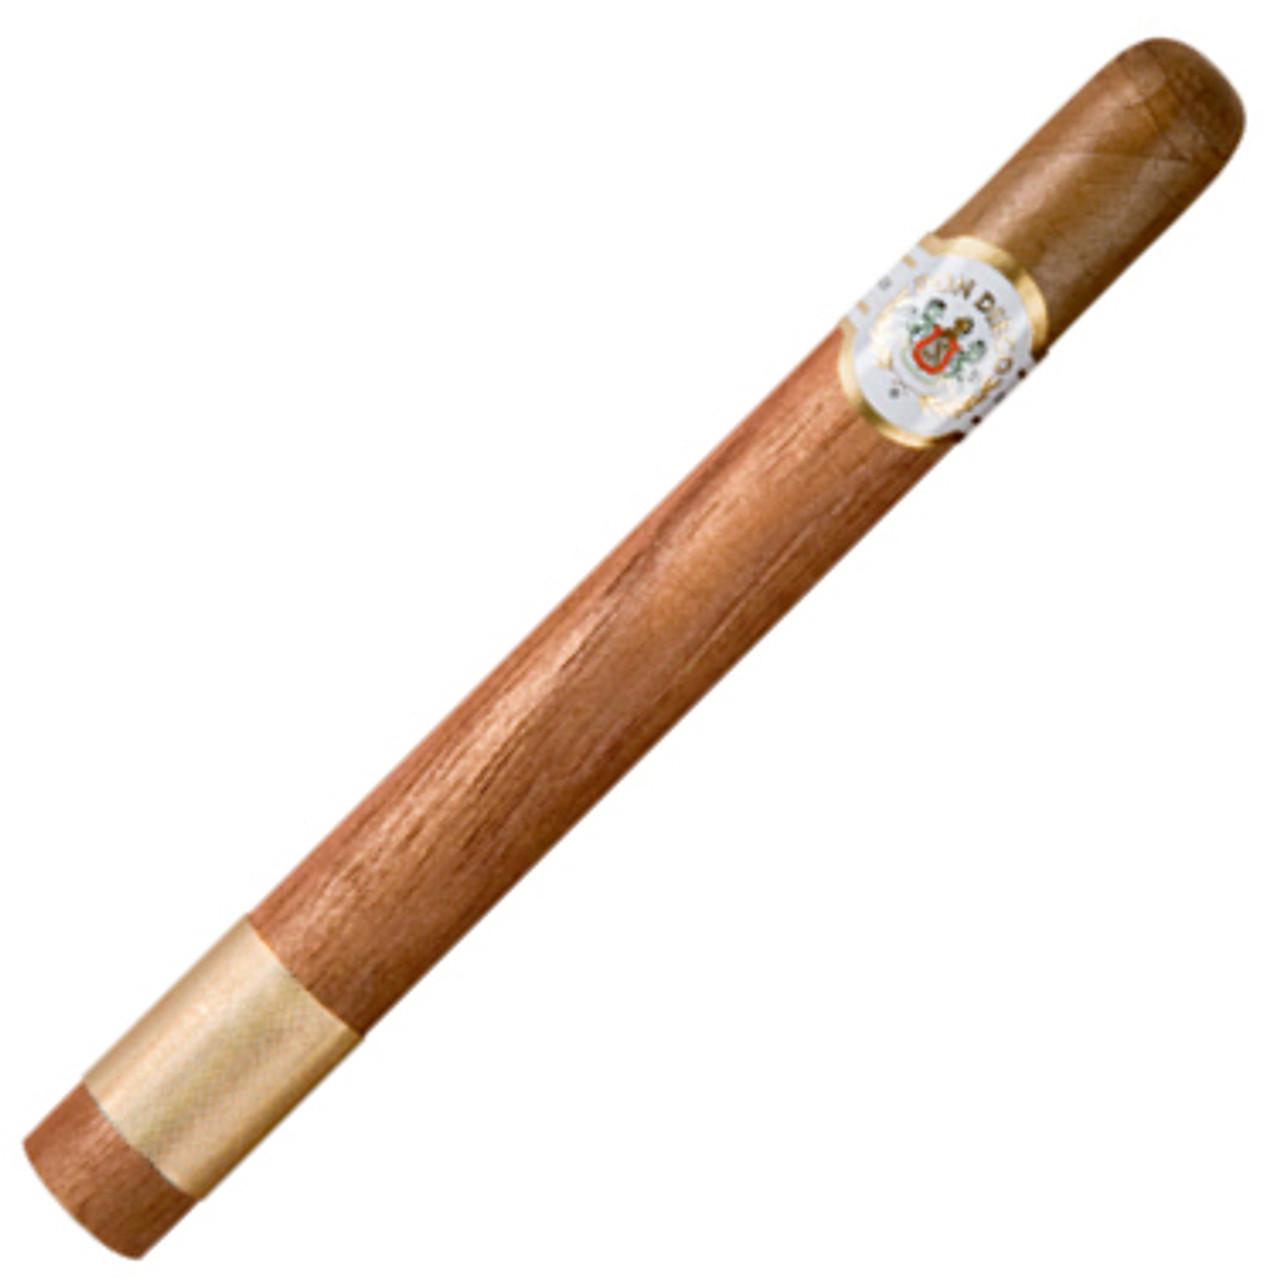 Don Diego Privada No. 1 Cigars - 6.62 x 43 (Box of 25)